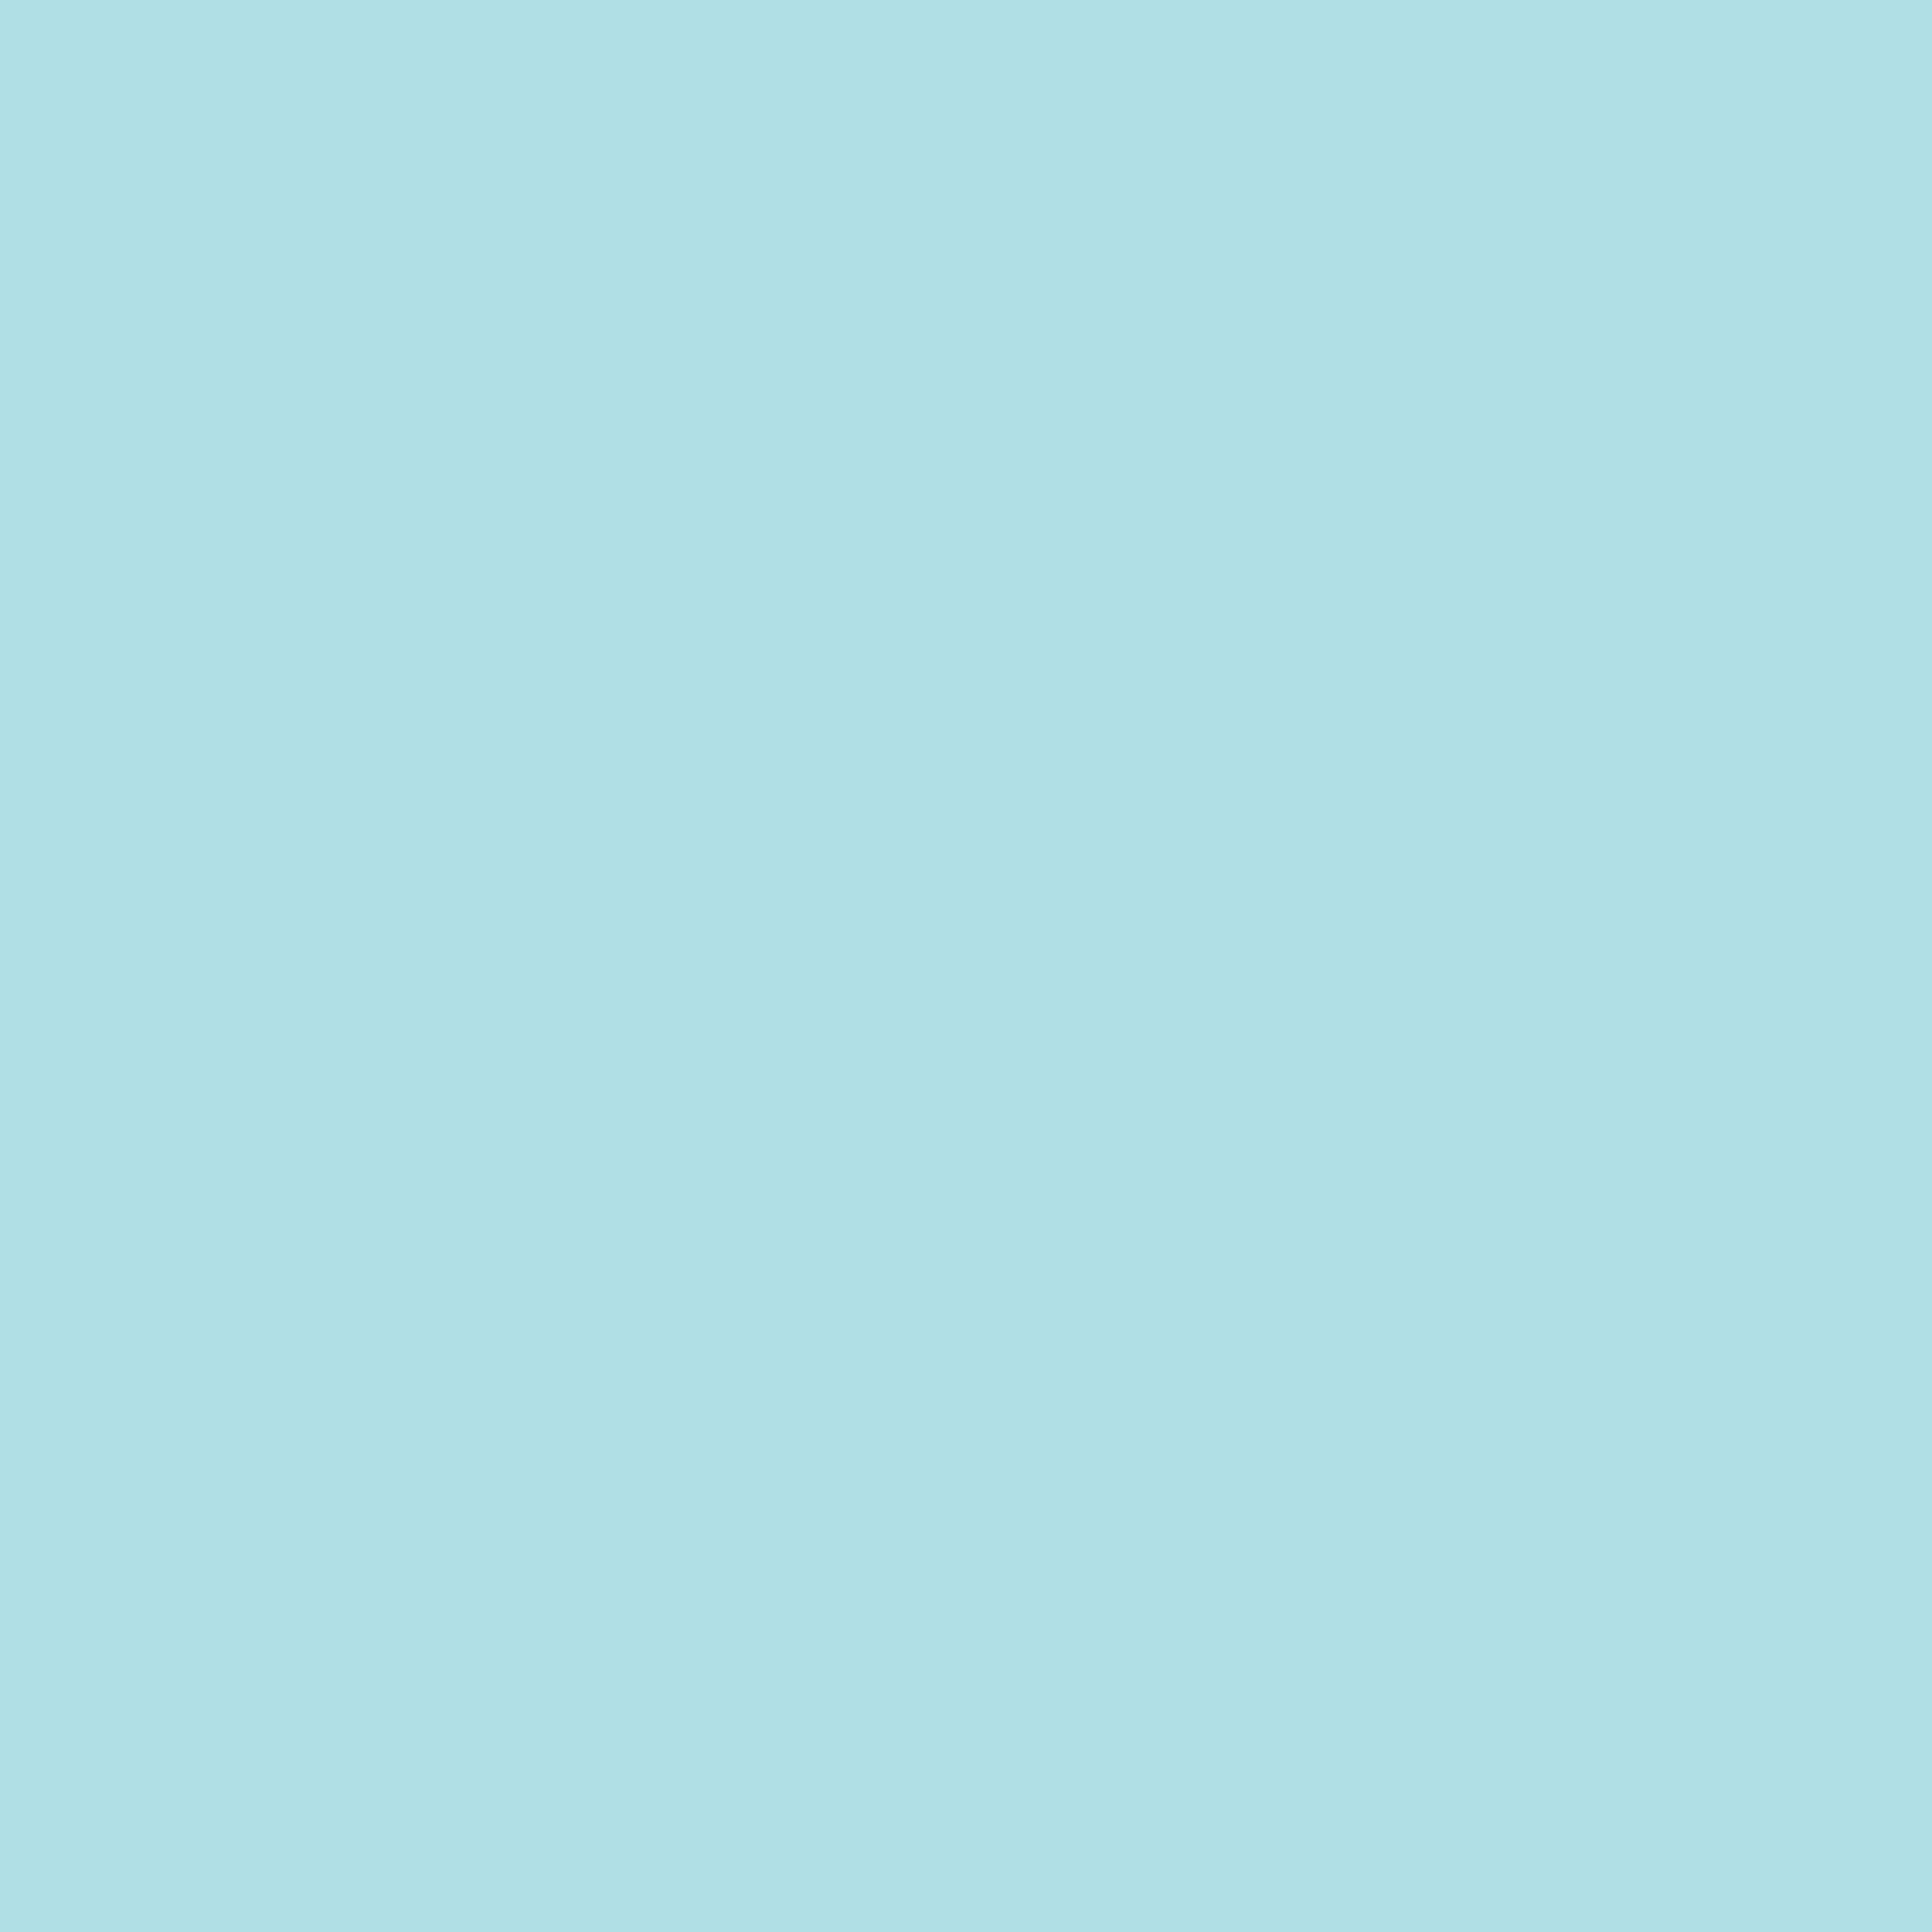 3600x3600 Powder Blue Web Solid Color Background